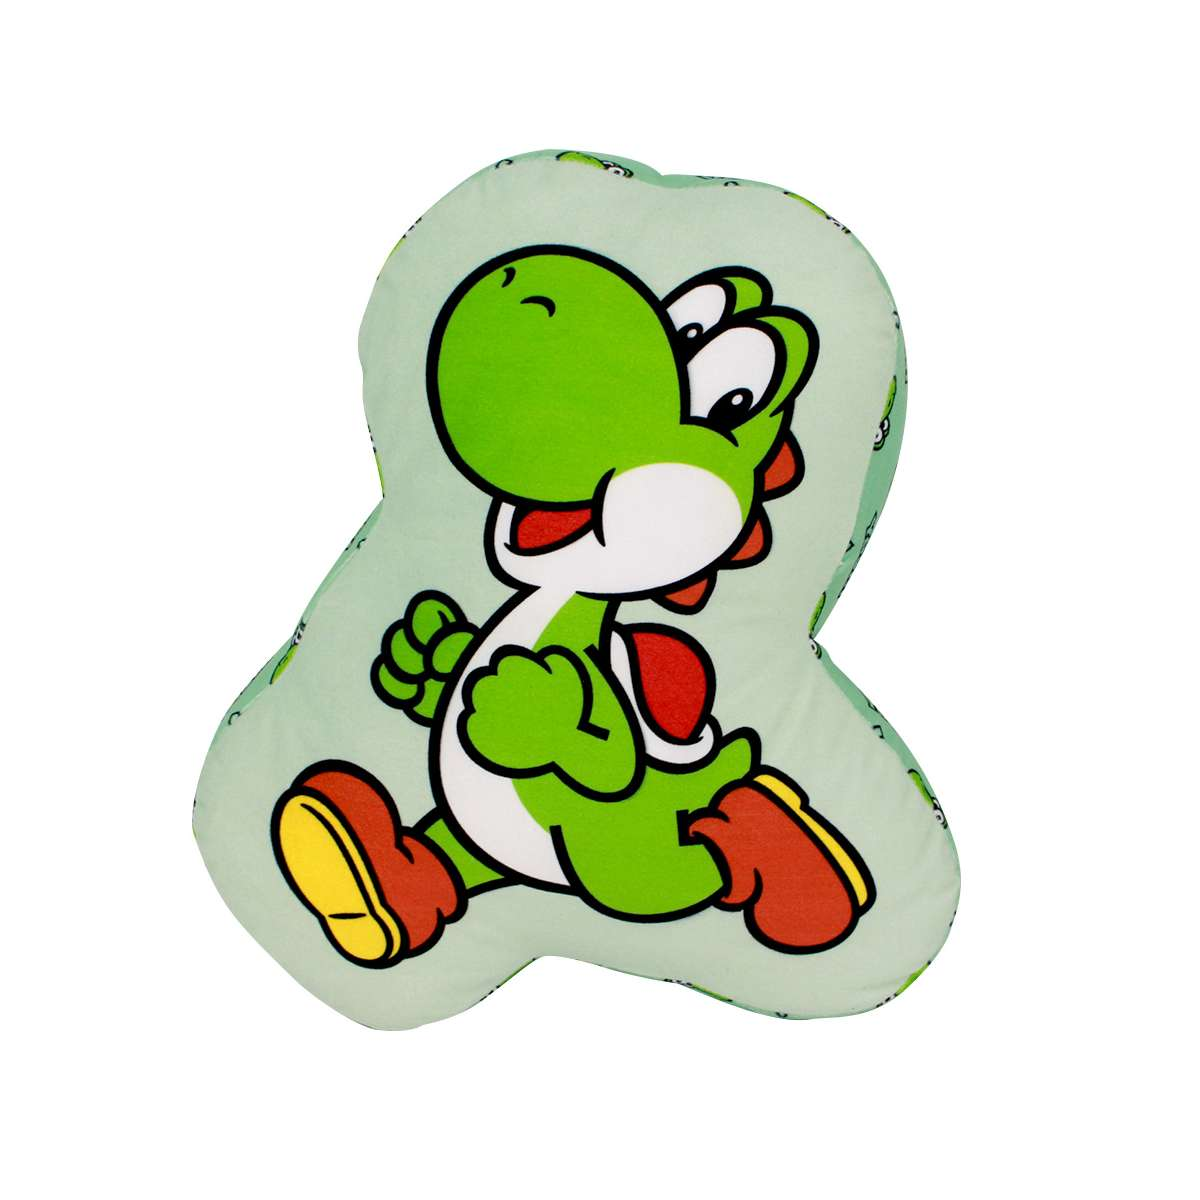 Almofada Decorativa Yoshi Super Mario Bros Nintendo